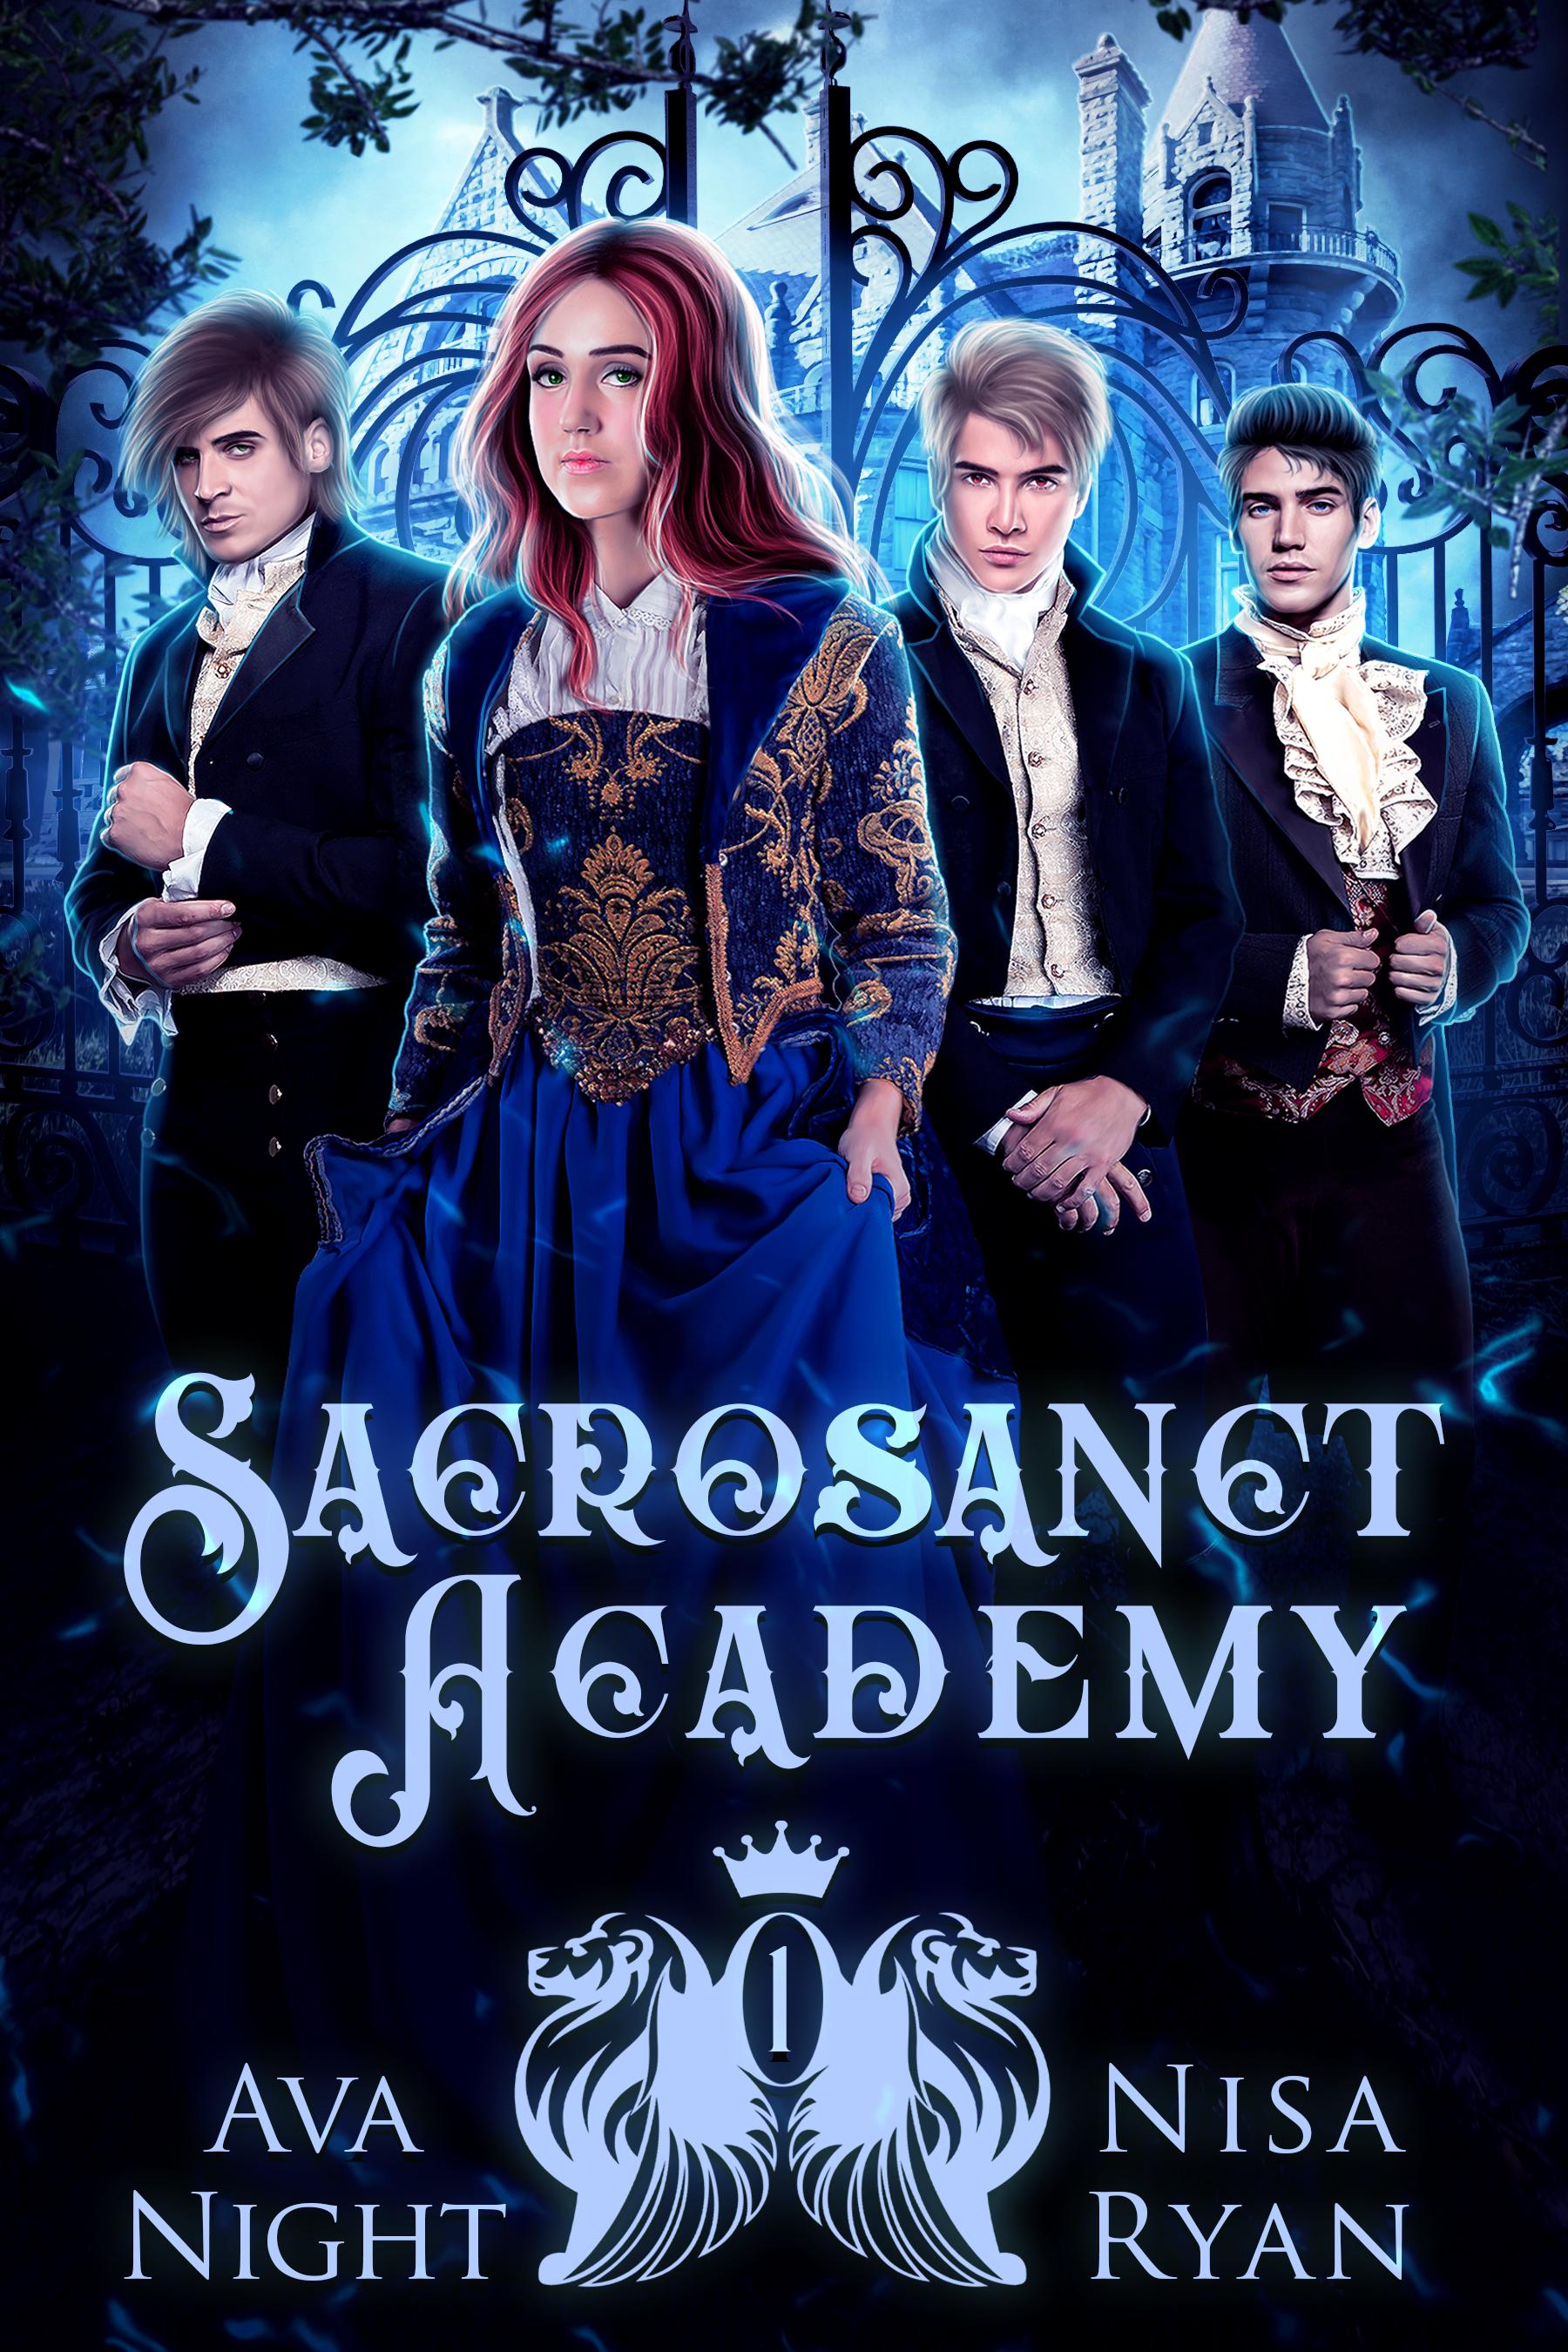 Sacrosanct Academy